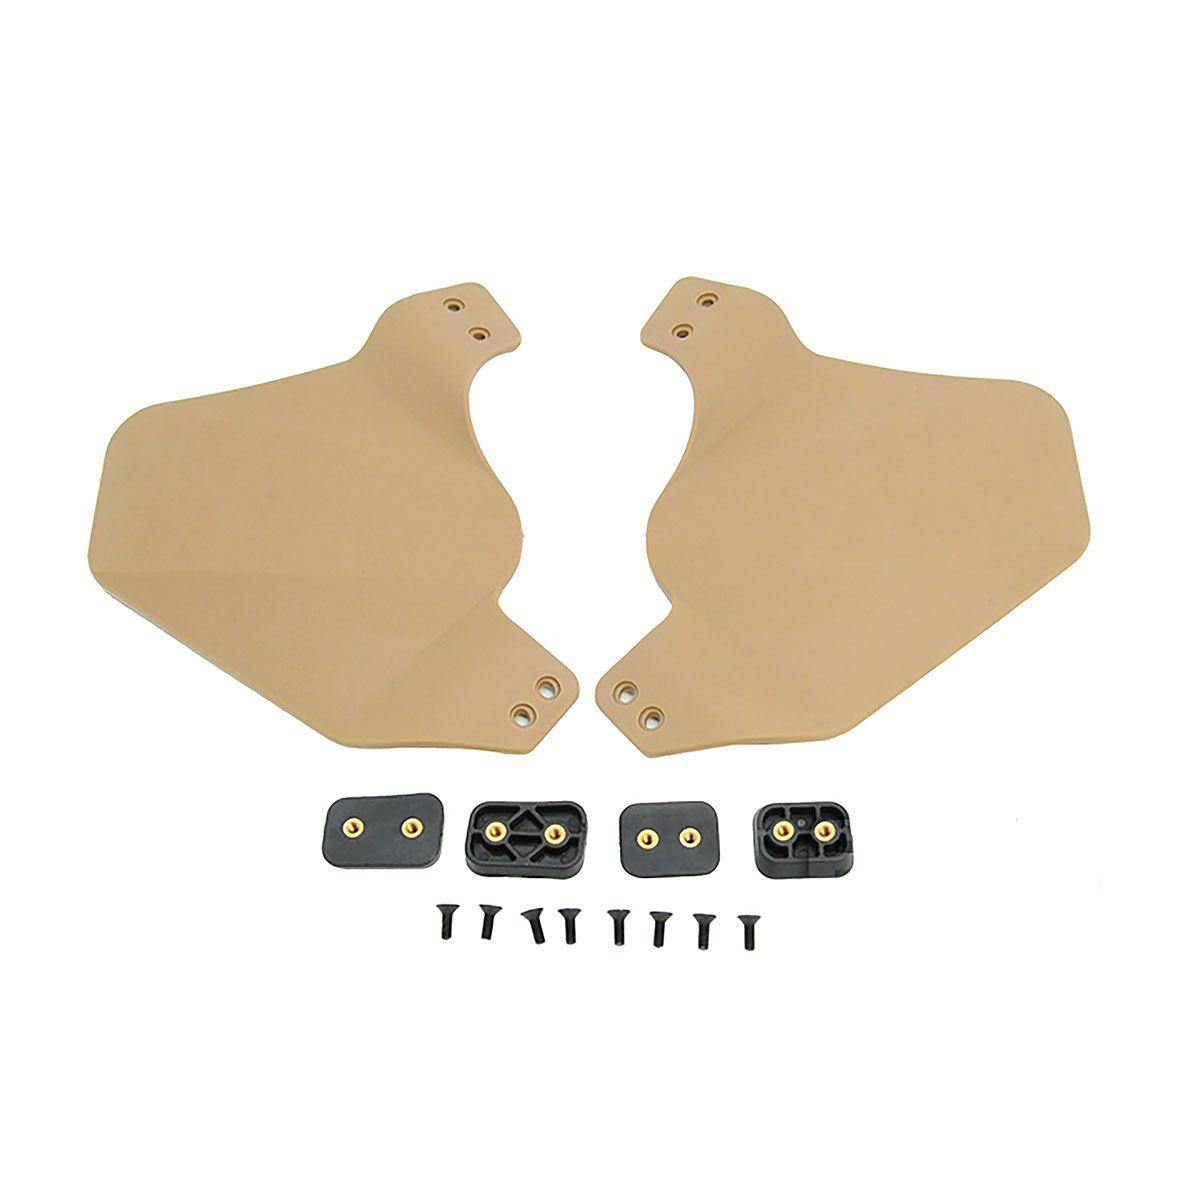 Protetor Lateral para Capacete - FMA TB295BK - TAN